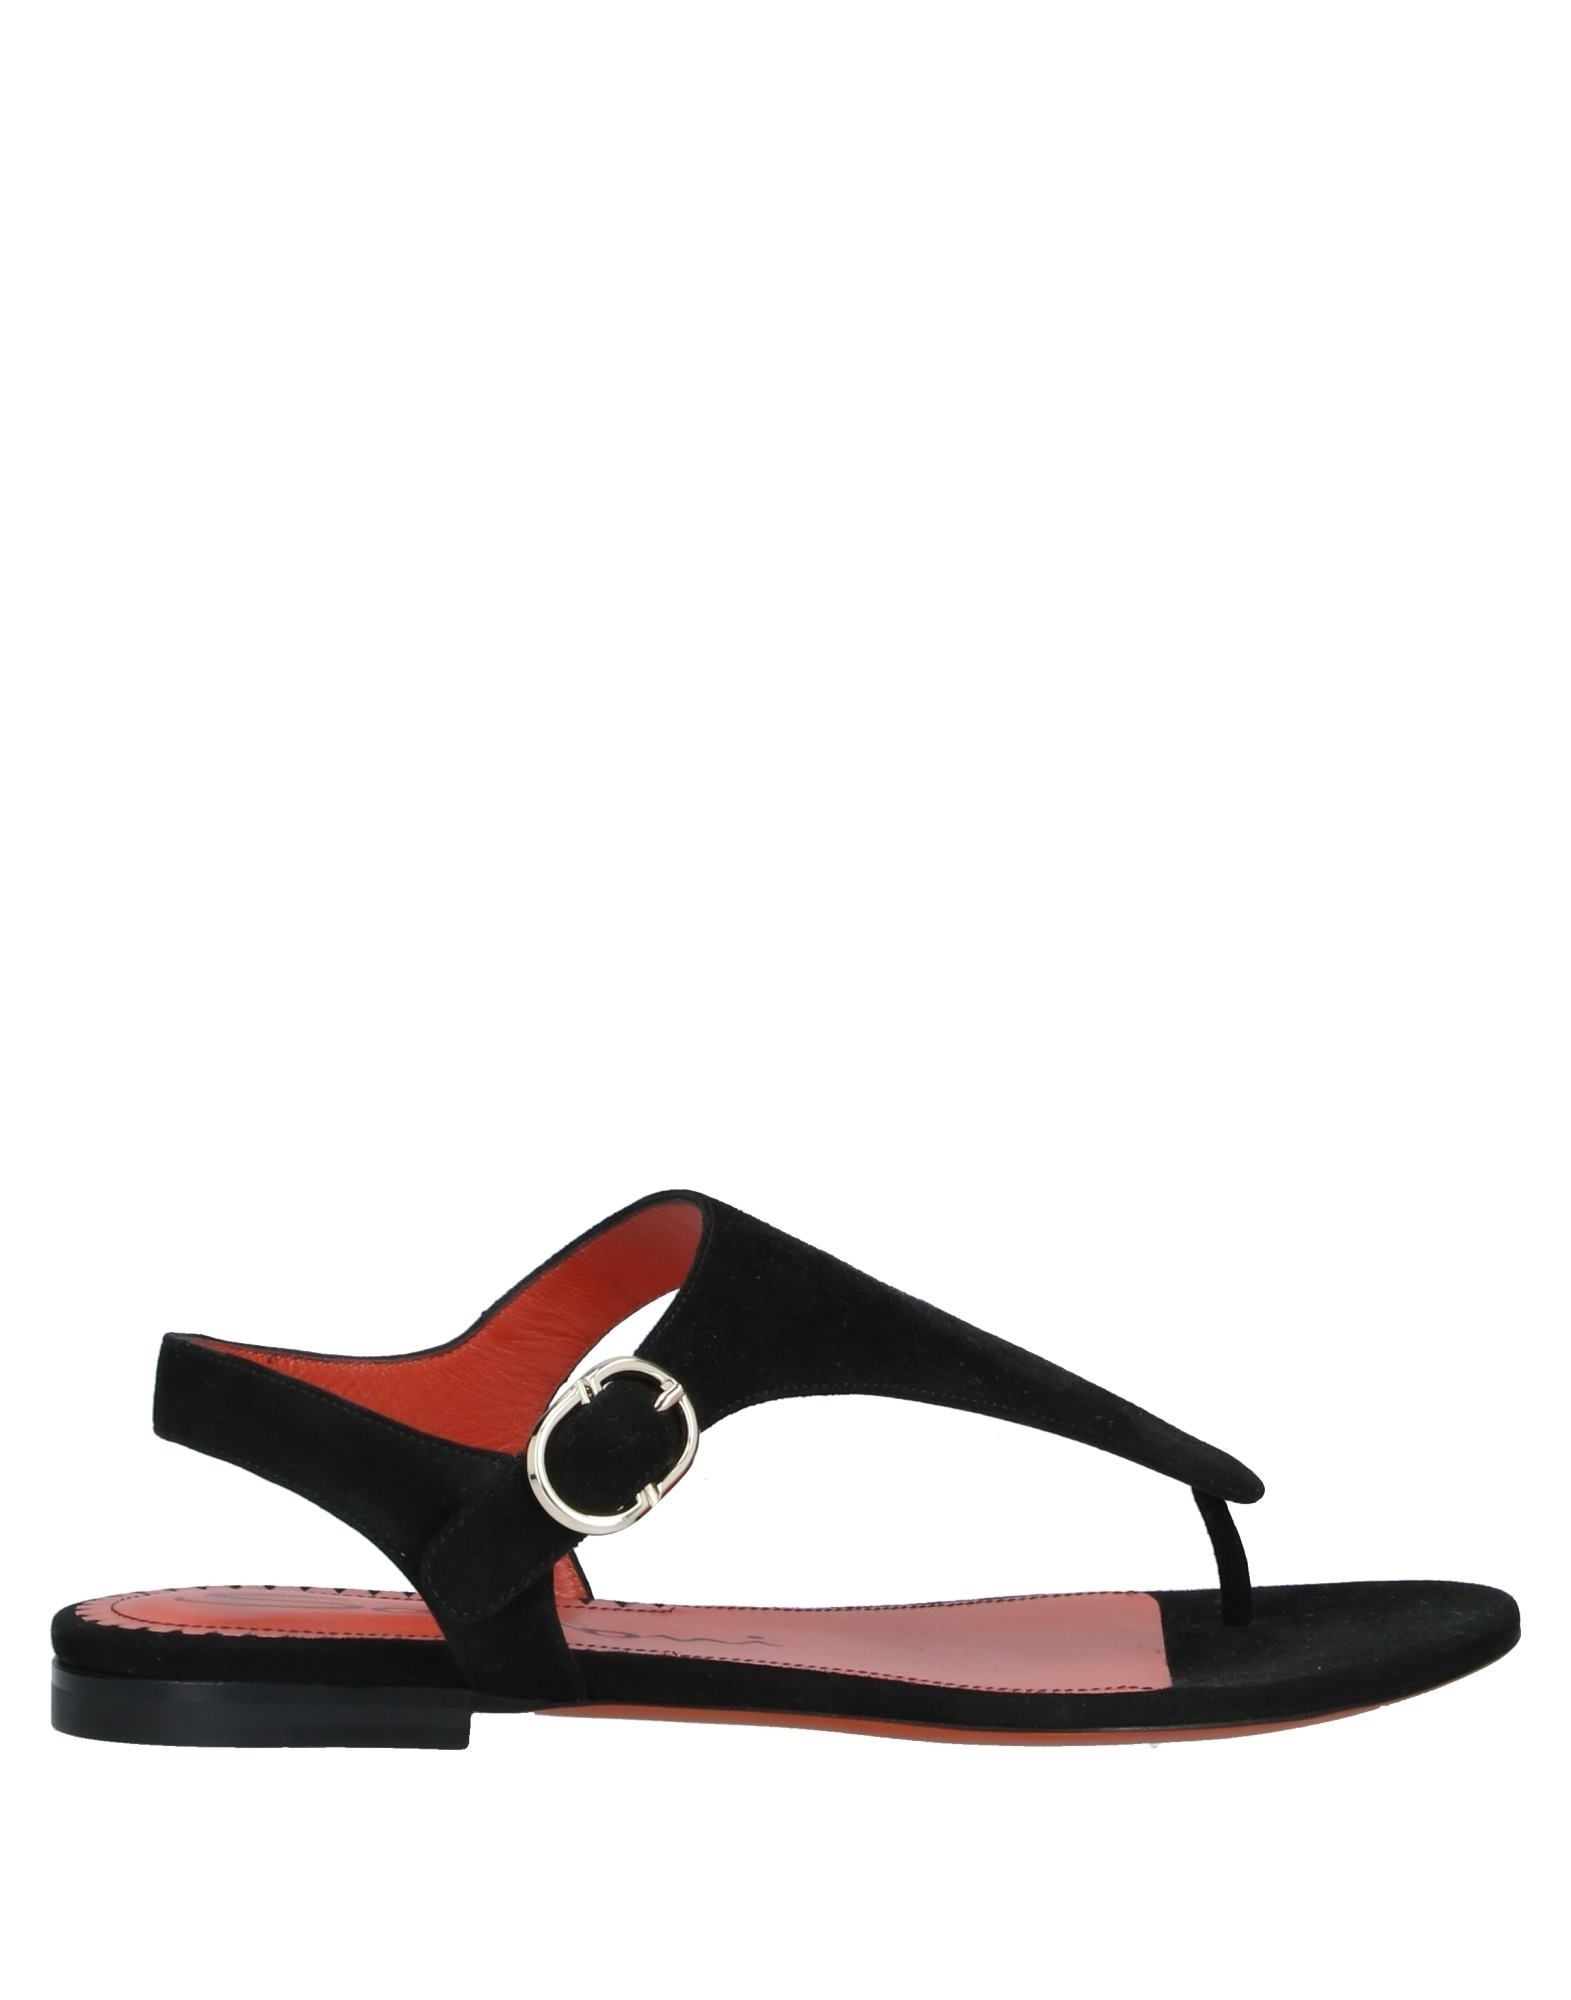 Santoni Women's Toe Post Sandals Black Leather